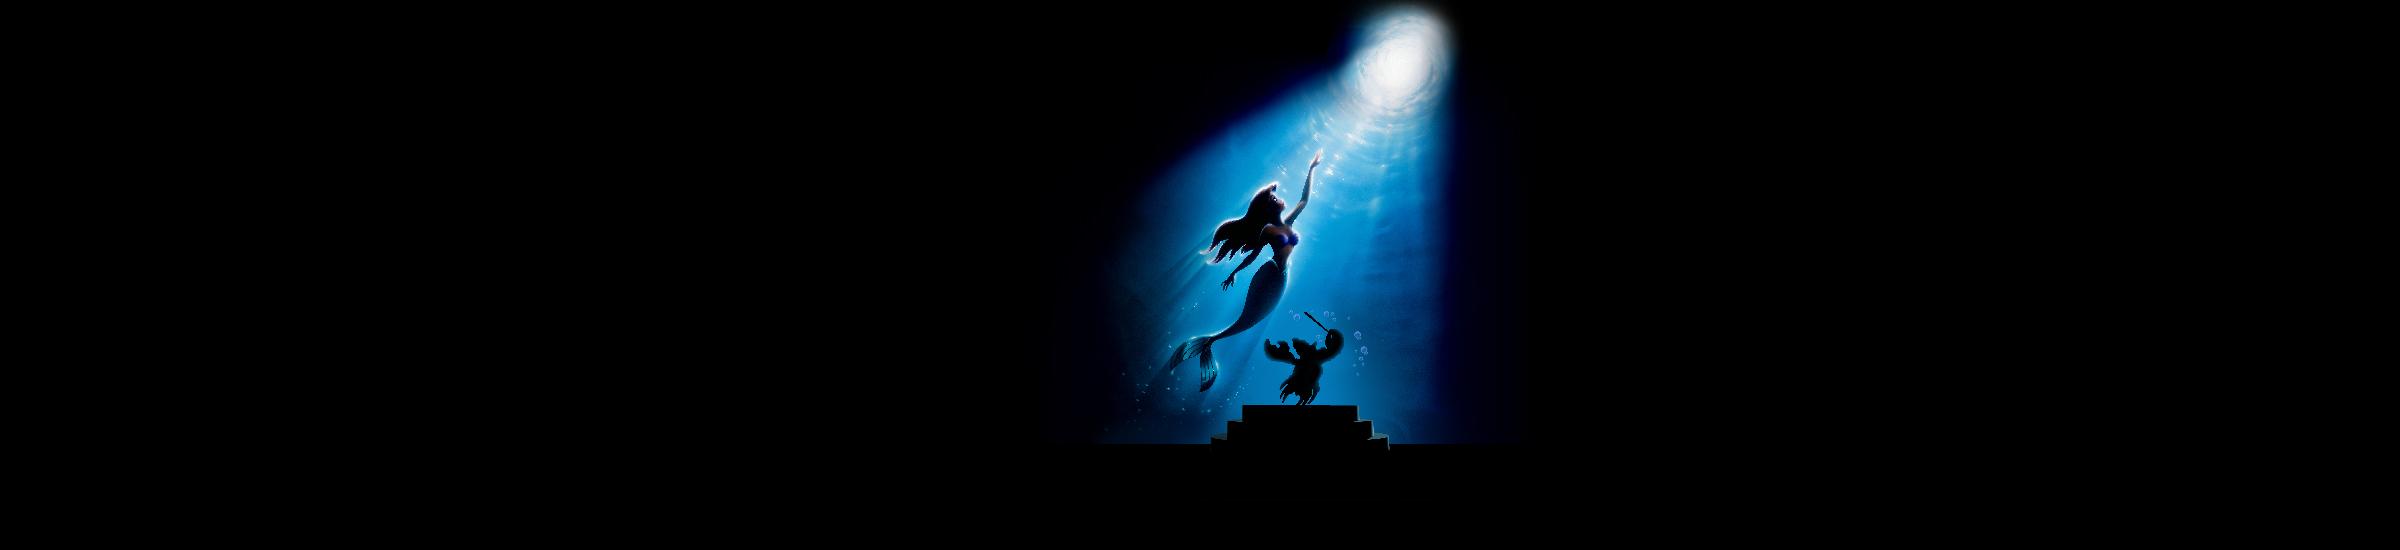 The Little Mermaid Houston Symphony